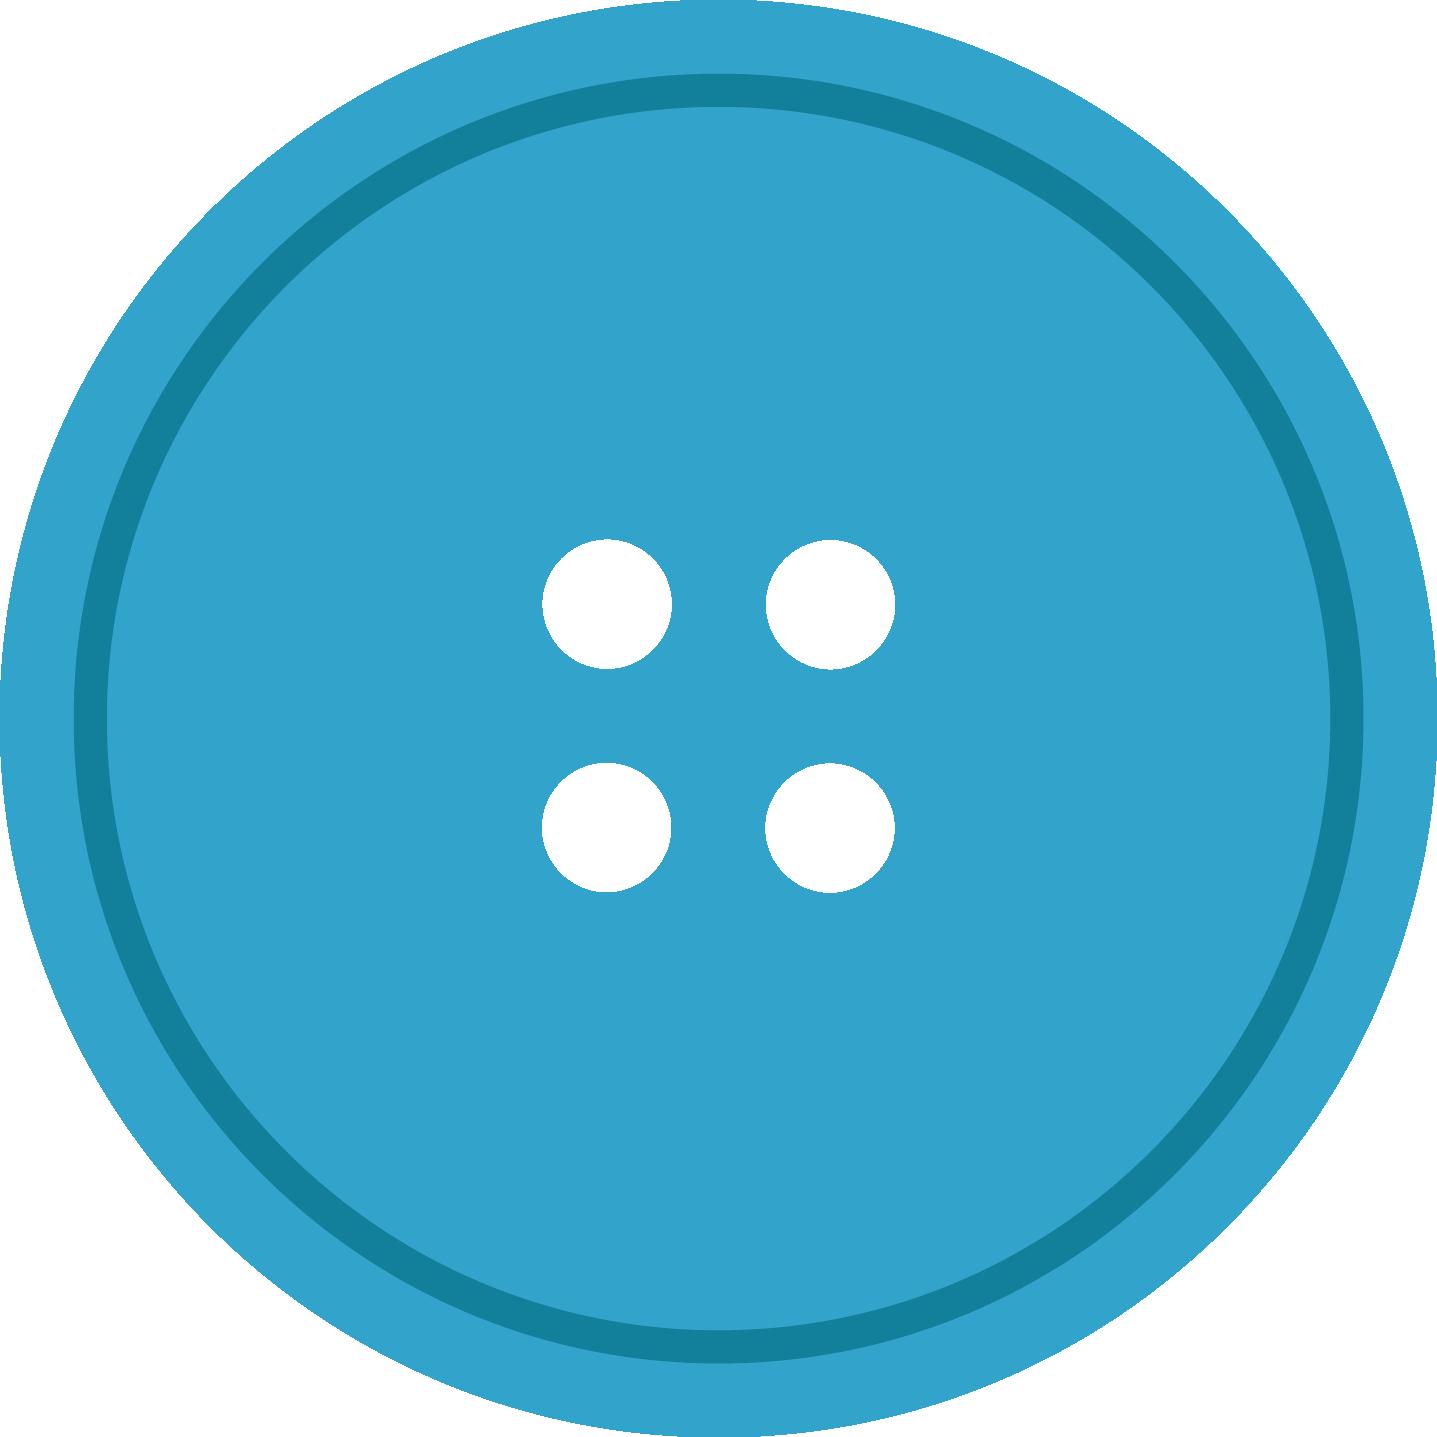 Blue round cloth button. Buttons clipart transparent background